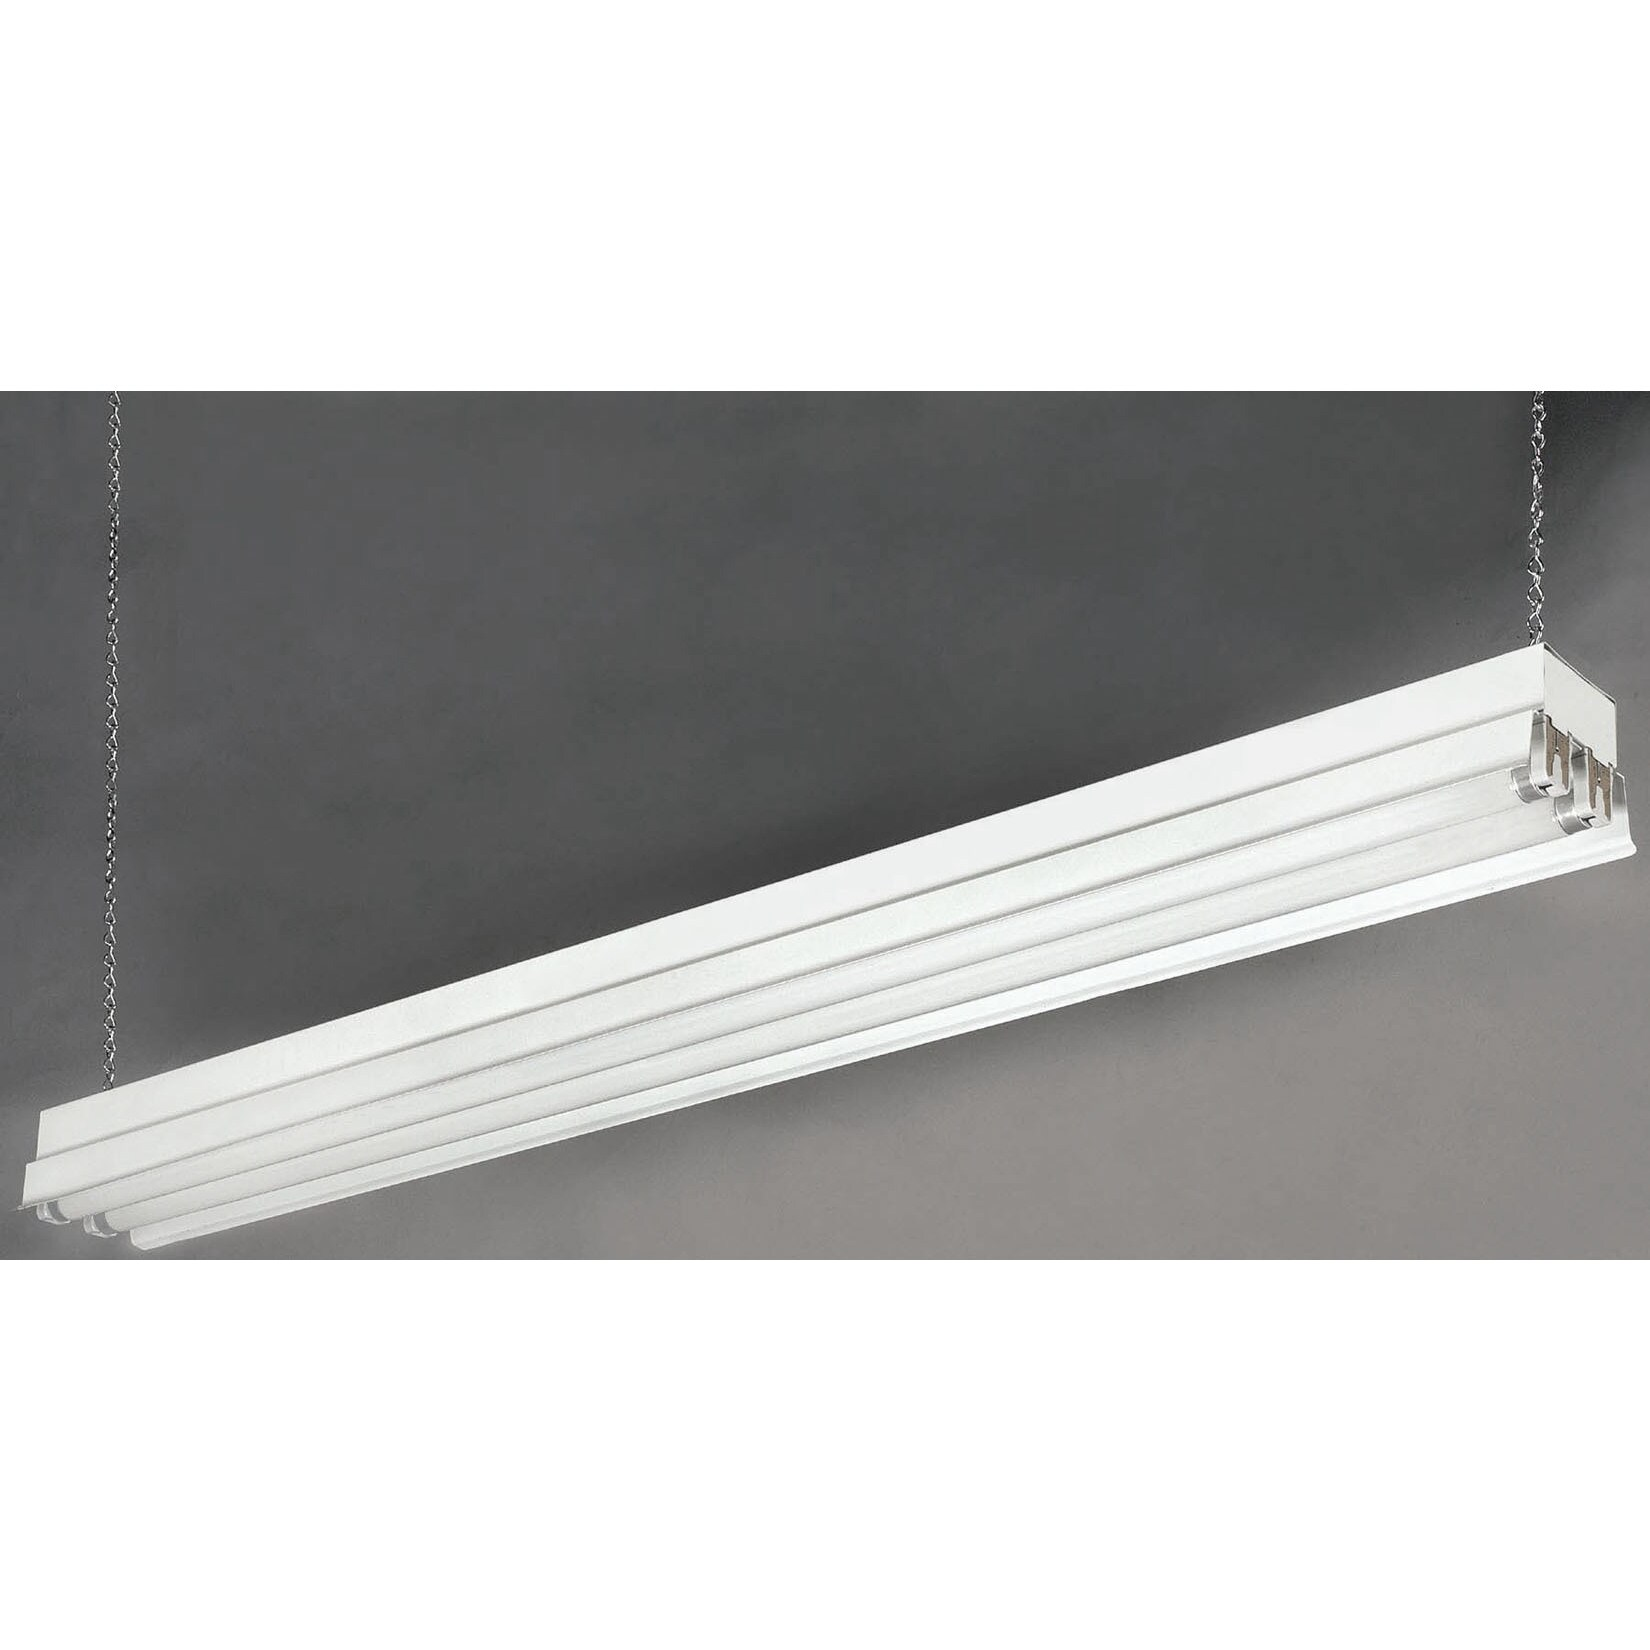 "Canarm EFS848232V 48"" Fluorescent All Season Shop Light (..."